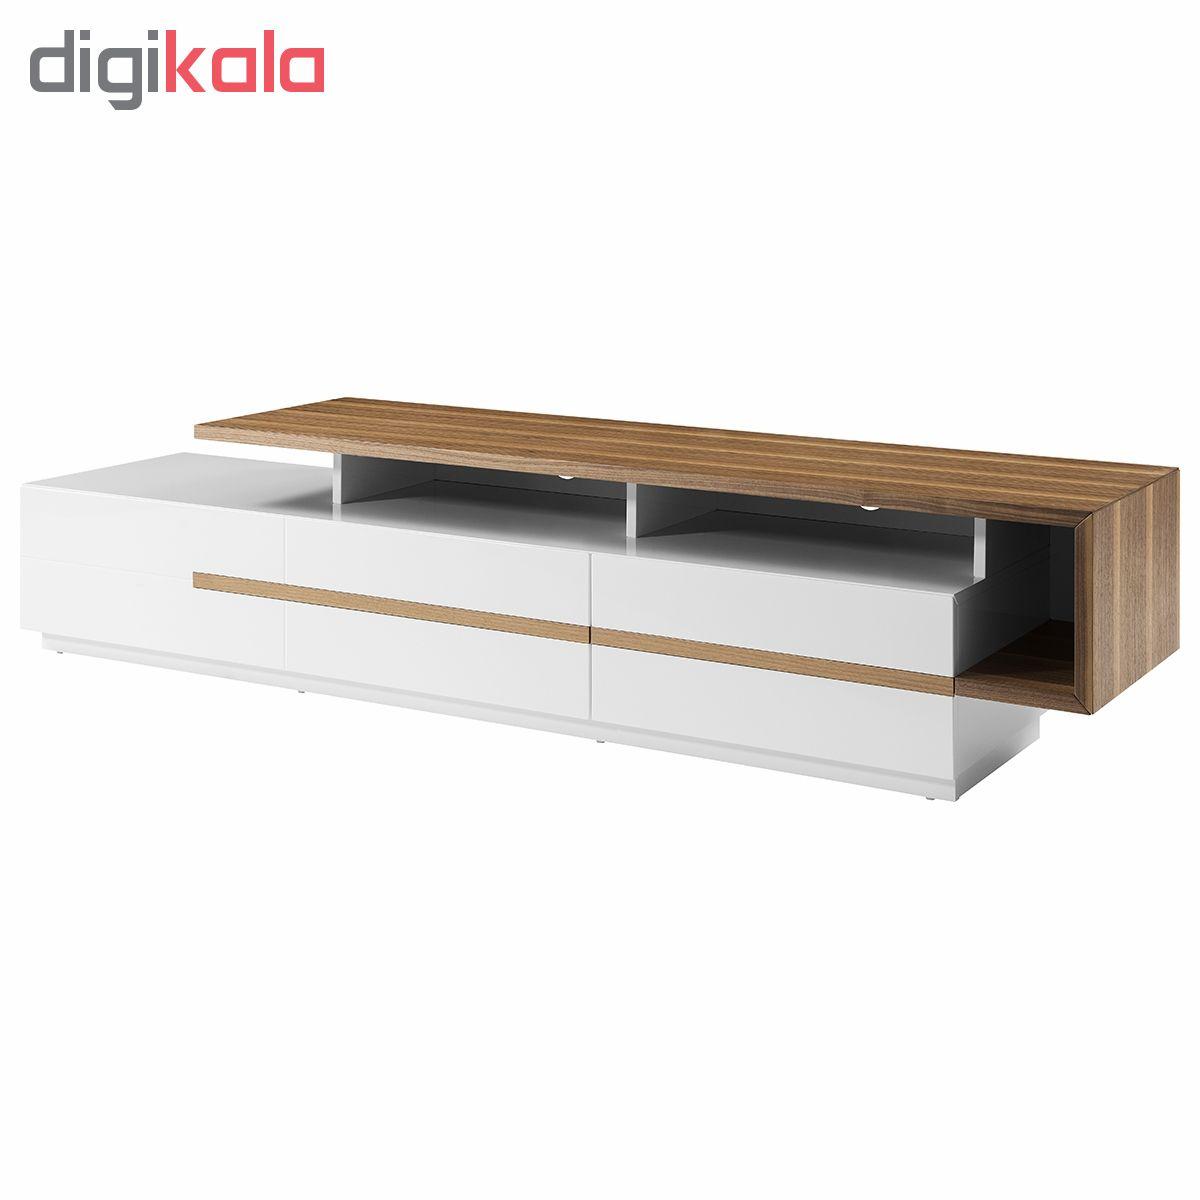 خرید اینترنتی میز تلویزیون مدل والتر کد 01 اورجینال